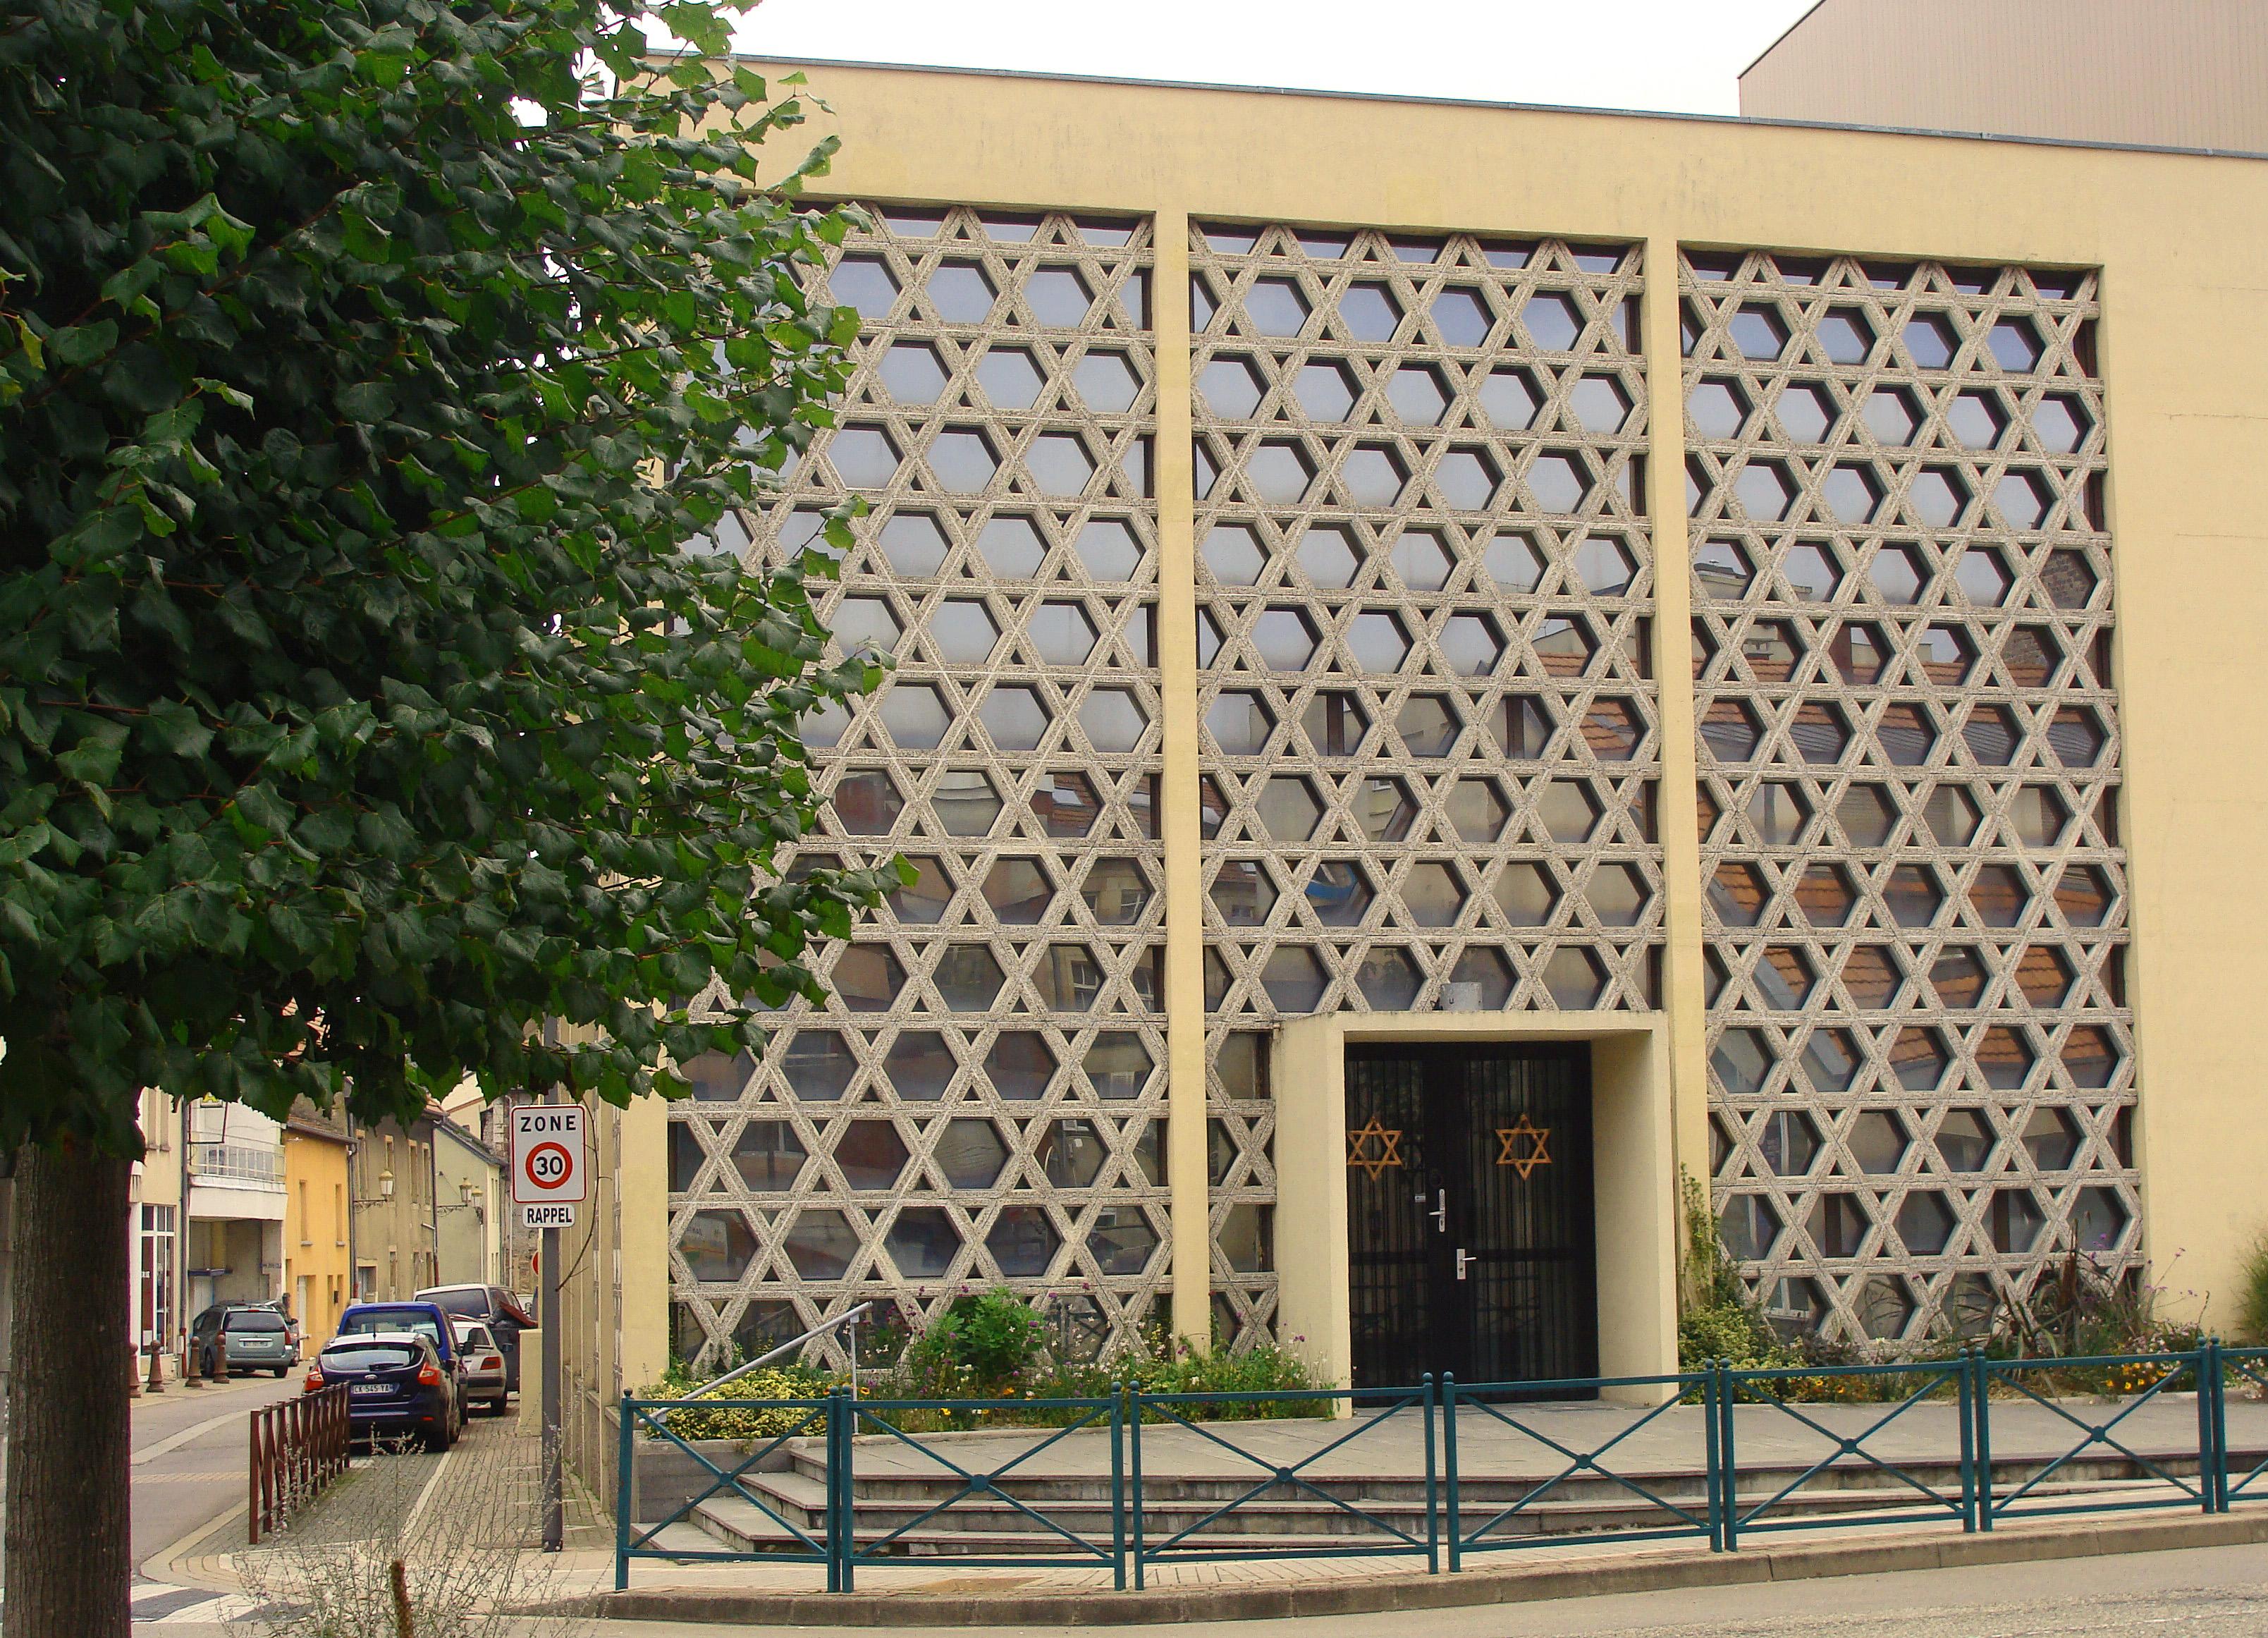 fichier:synagogue de saint-avold, façade principale — wikipédia